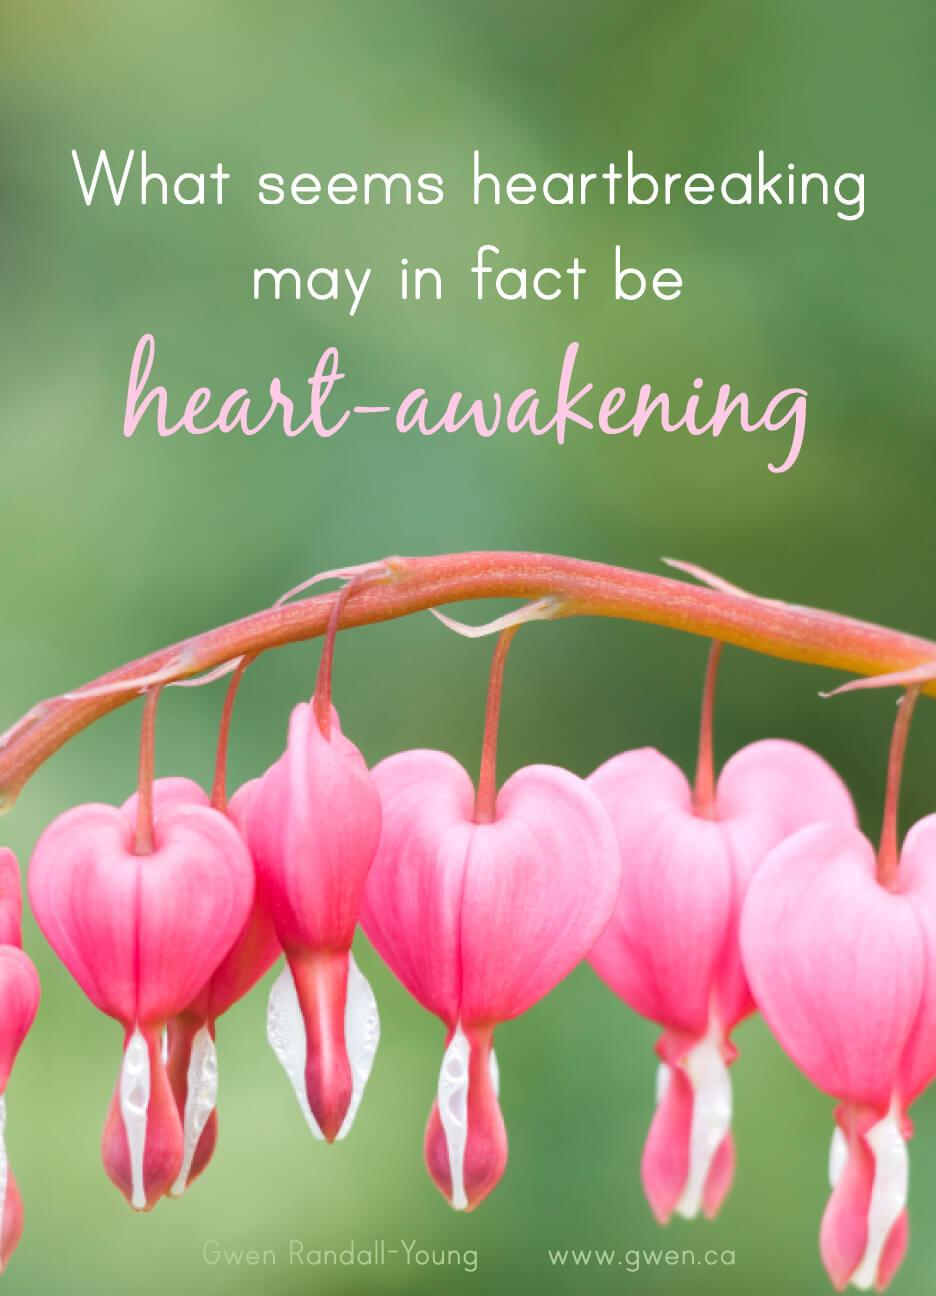 heart-awakening2